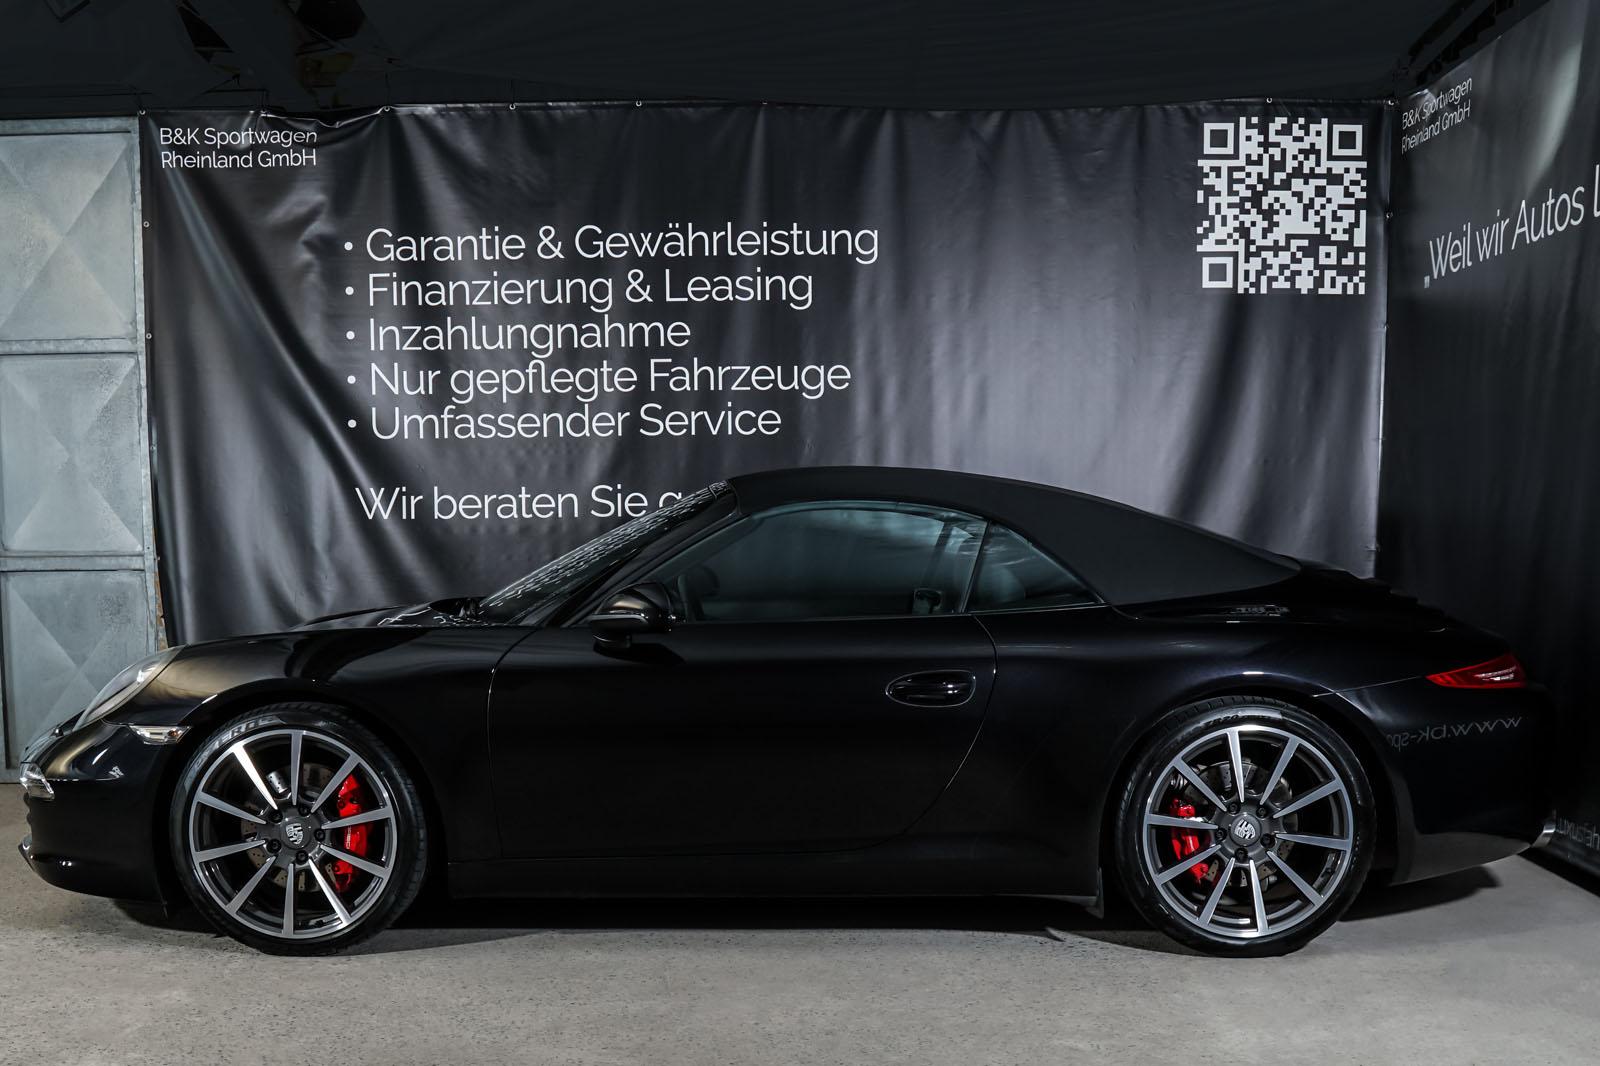 Porsche_991_CarreraS_Cabrio_Schwarz_Schwarz_POR-7555_5_w